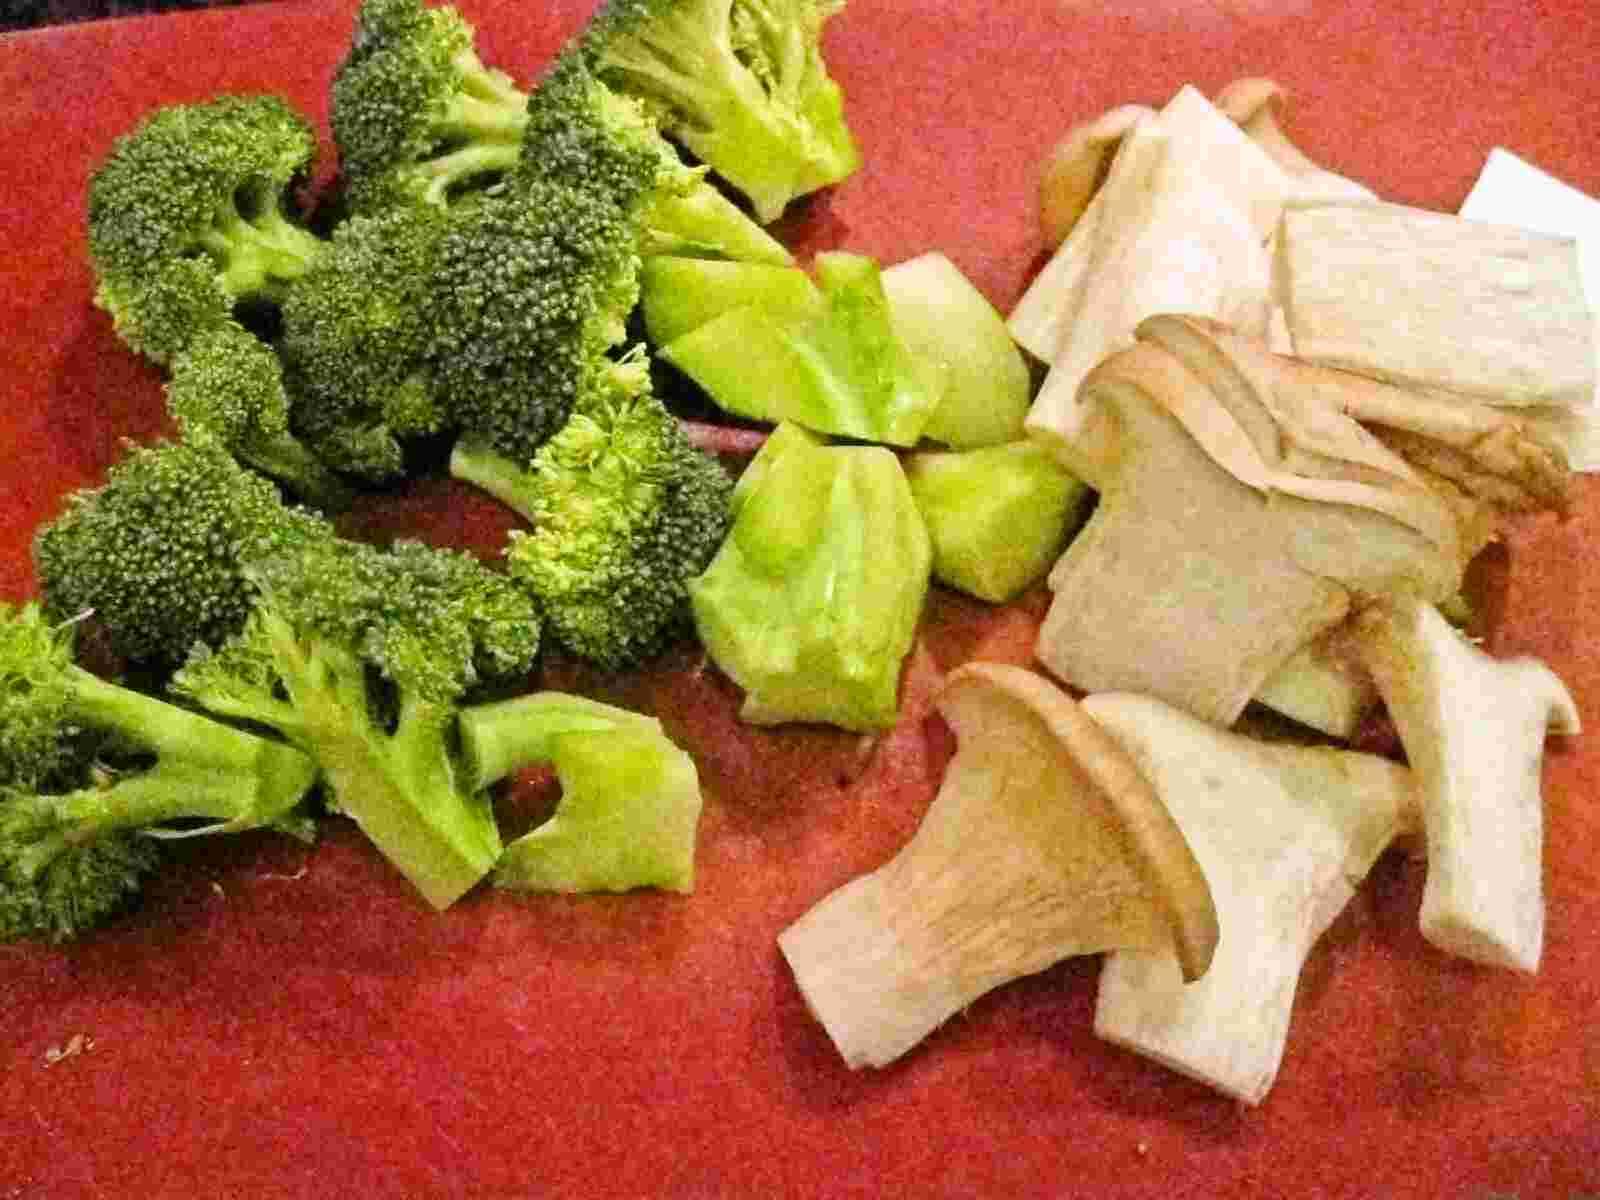 ... no sotee sarada / sauteed king oyster mushrooms and broccoli salad